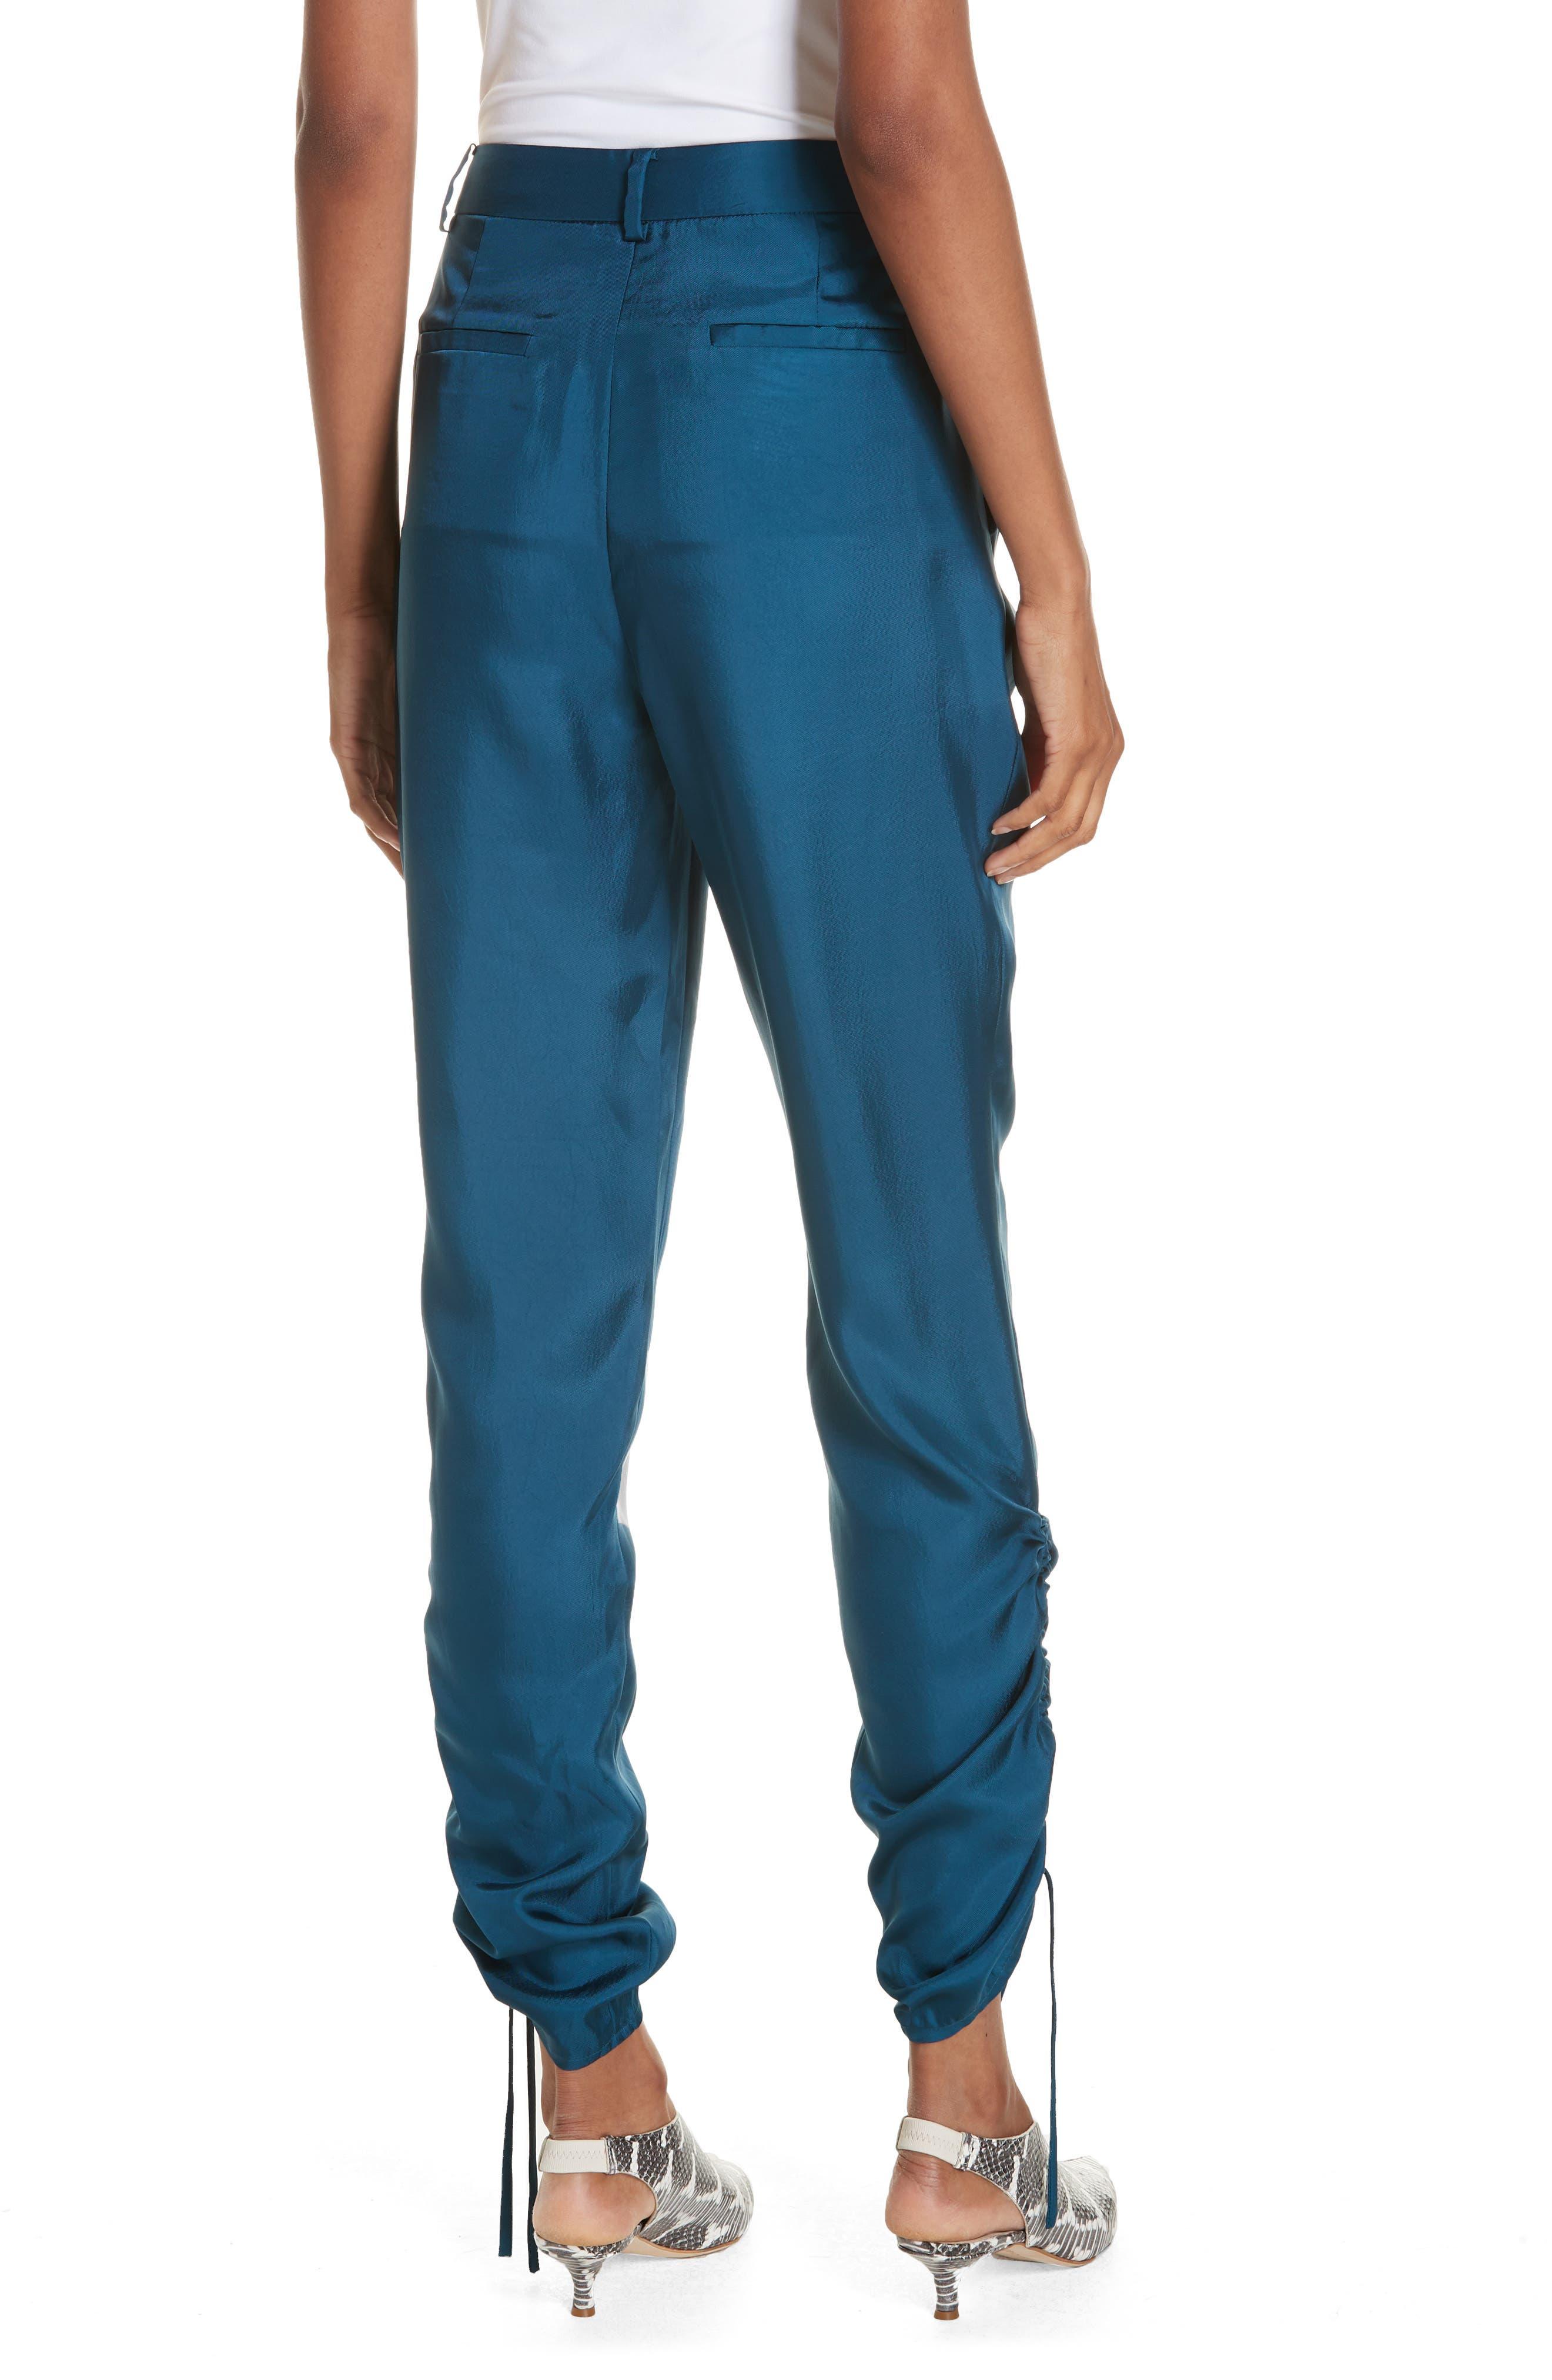 Mendini Twill Shirred Pants,                             Alternate thumbnail 2, color,                             TEAL BLUE